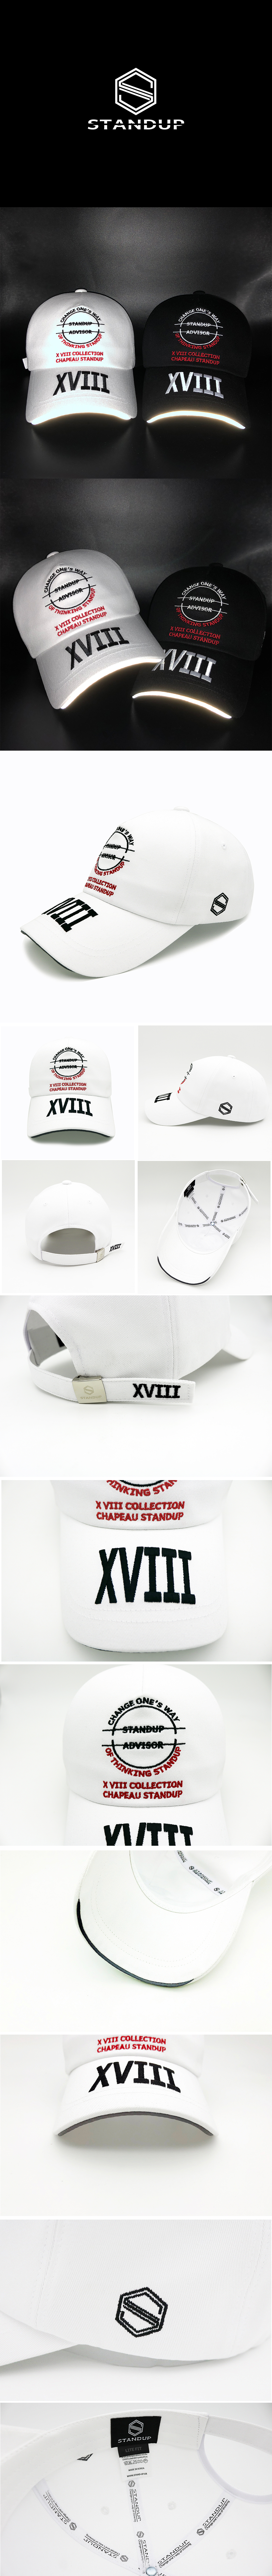 XVIII5_white.jpg